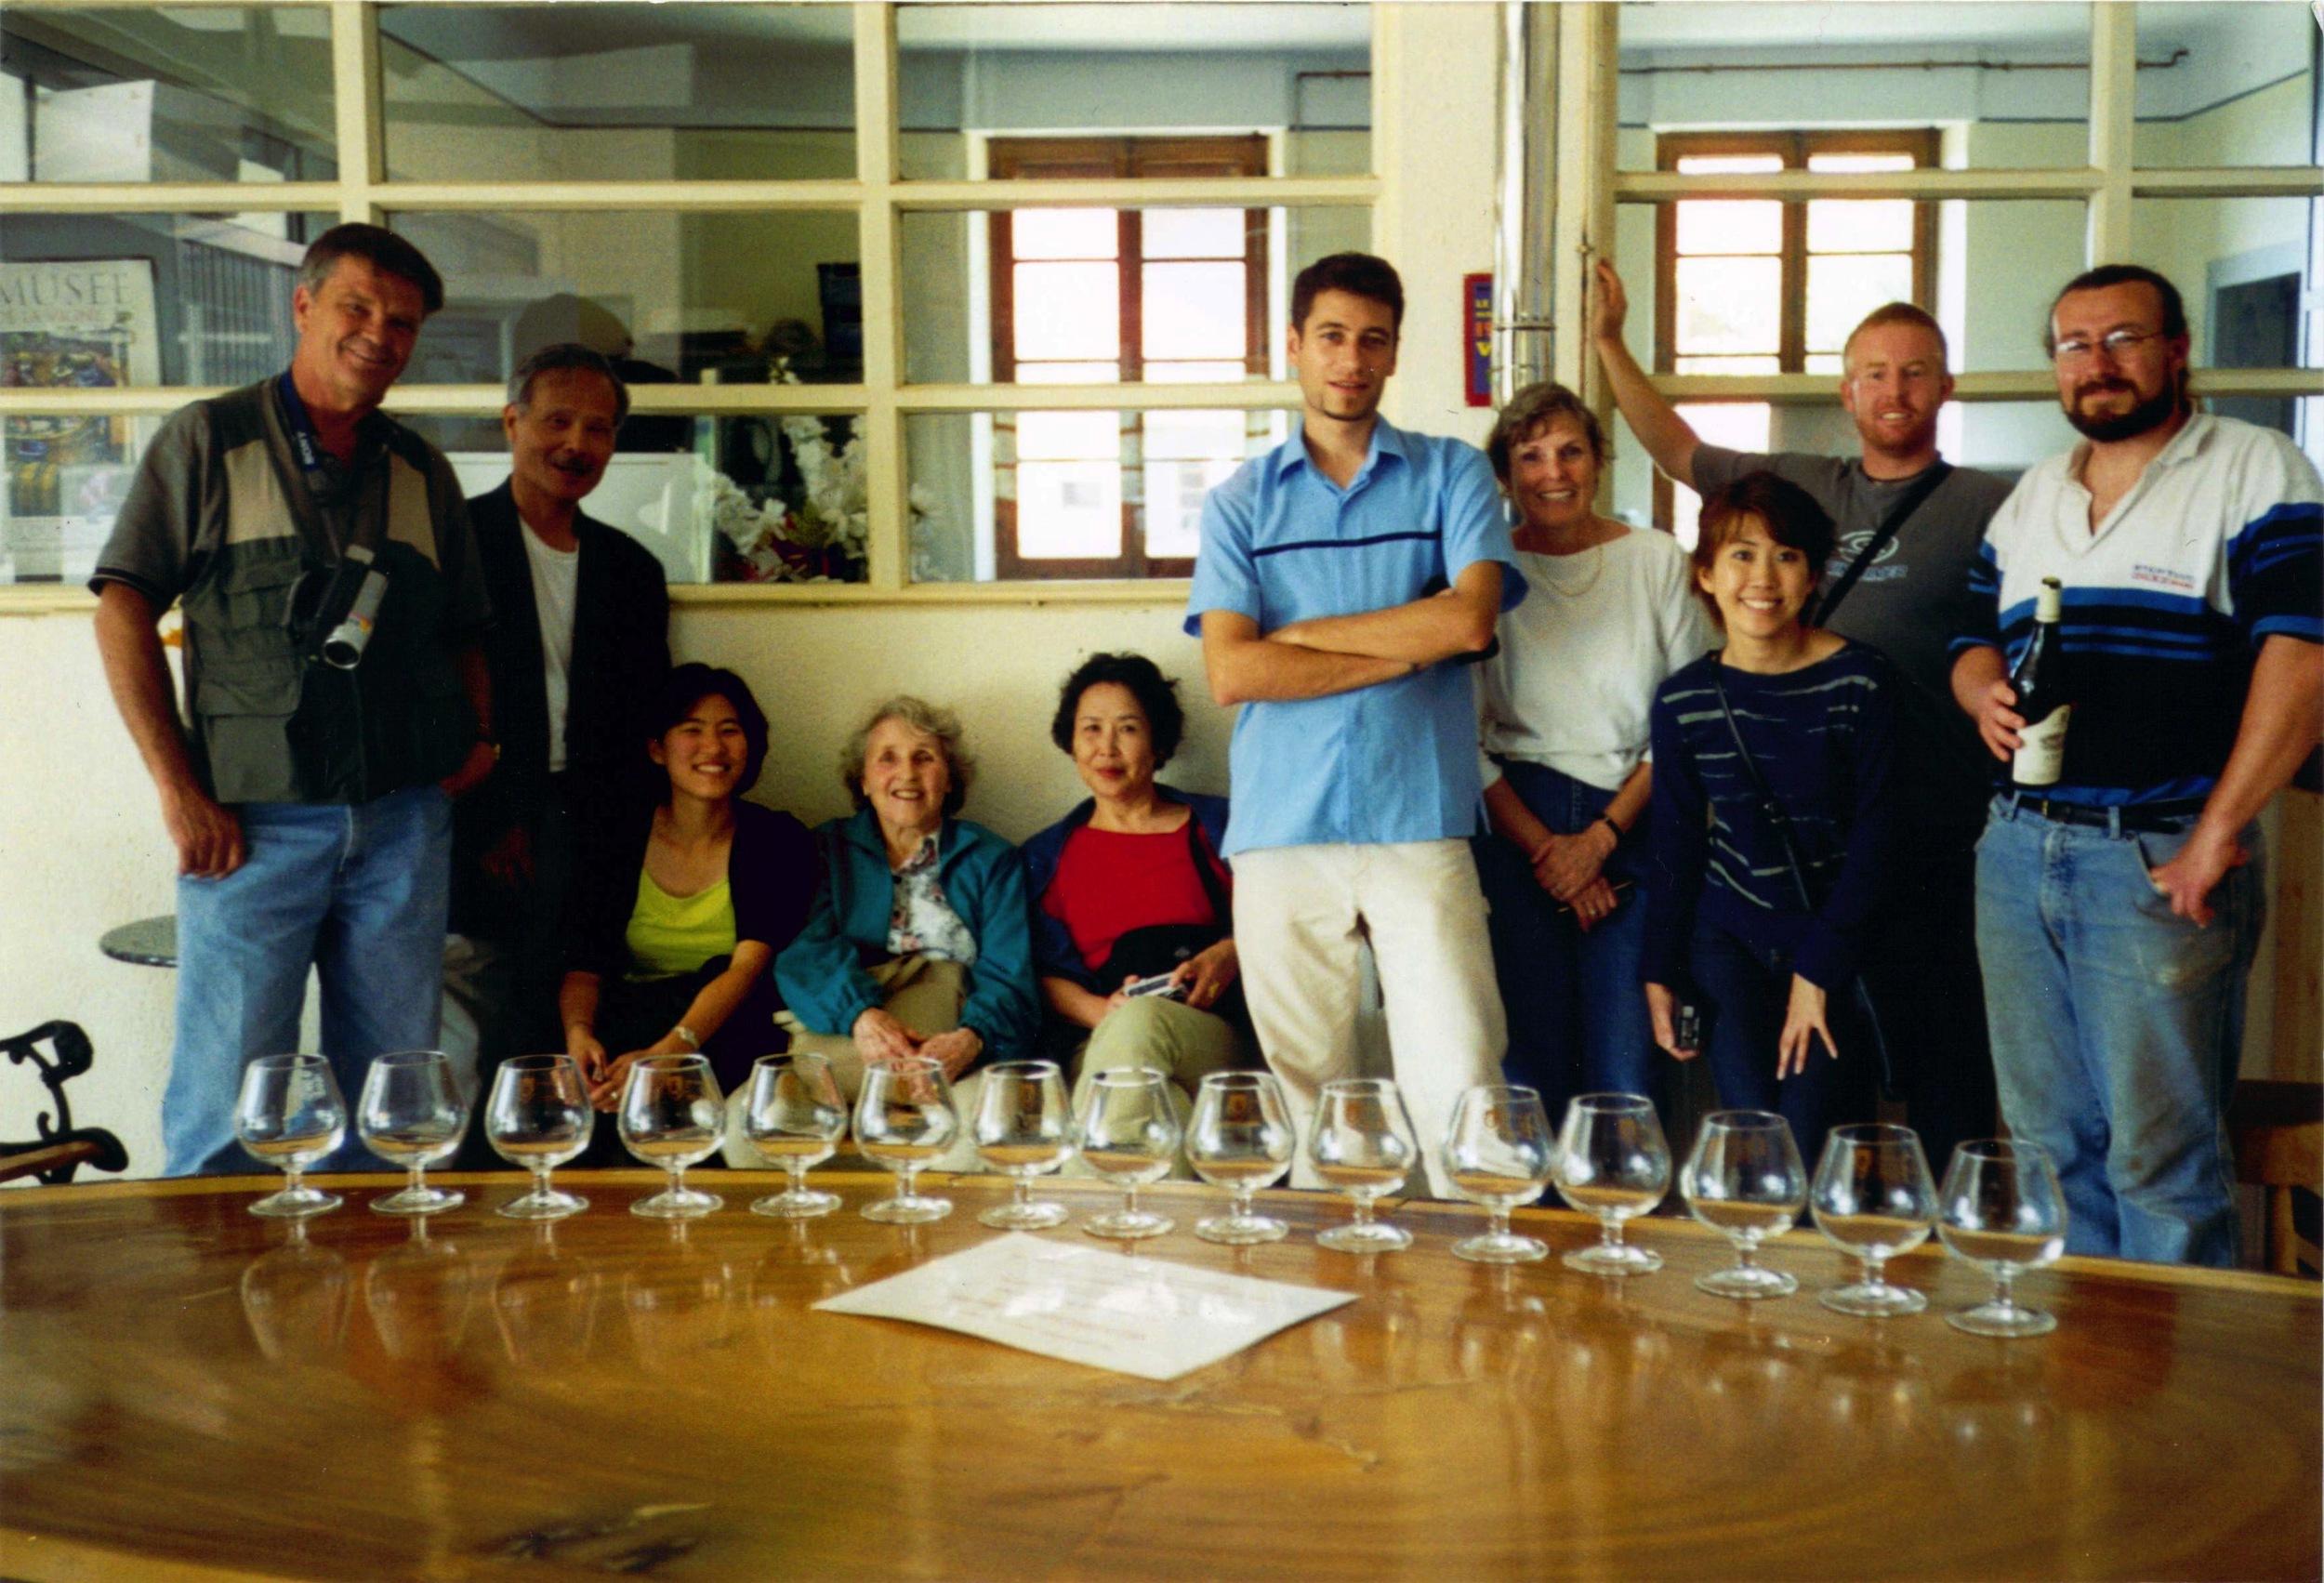 Wine Tasting at Domaine de La Pinte